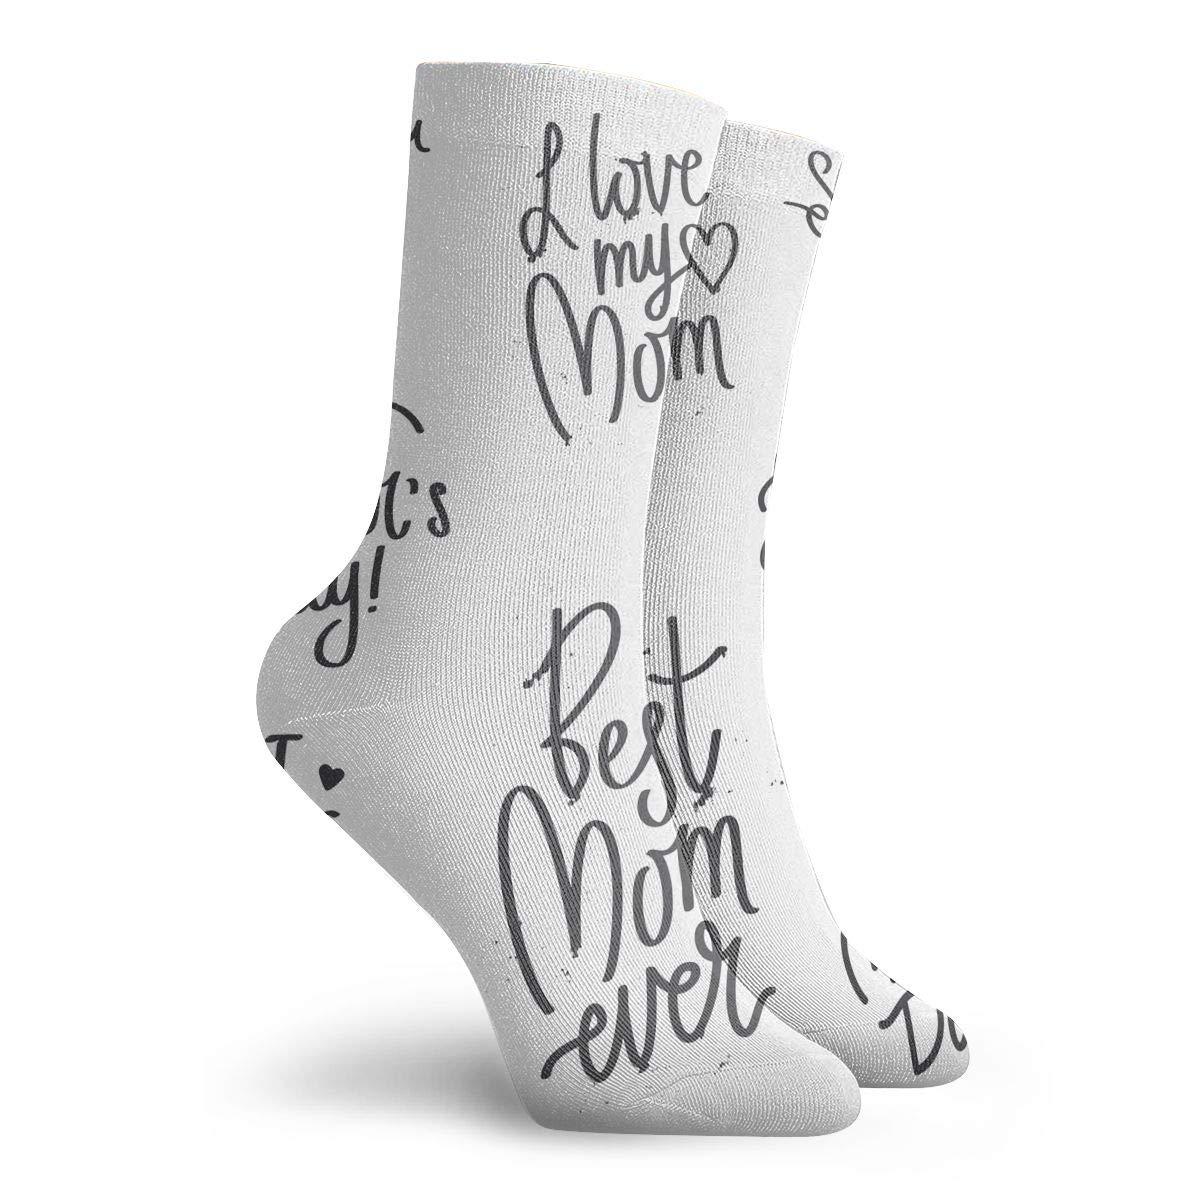 Quote I Love You Mom Fashion Dress Socks Short Socks Leisure Travel 11.8 Inch